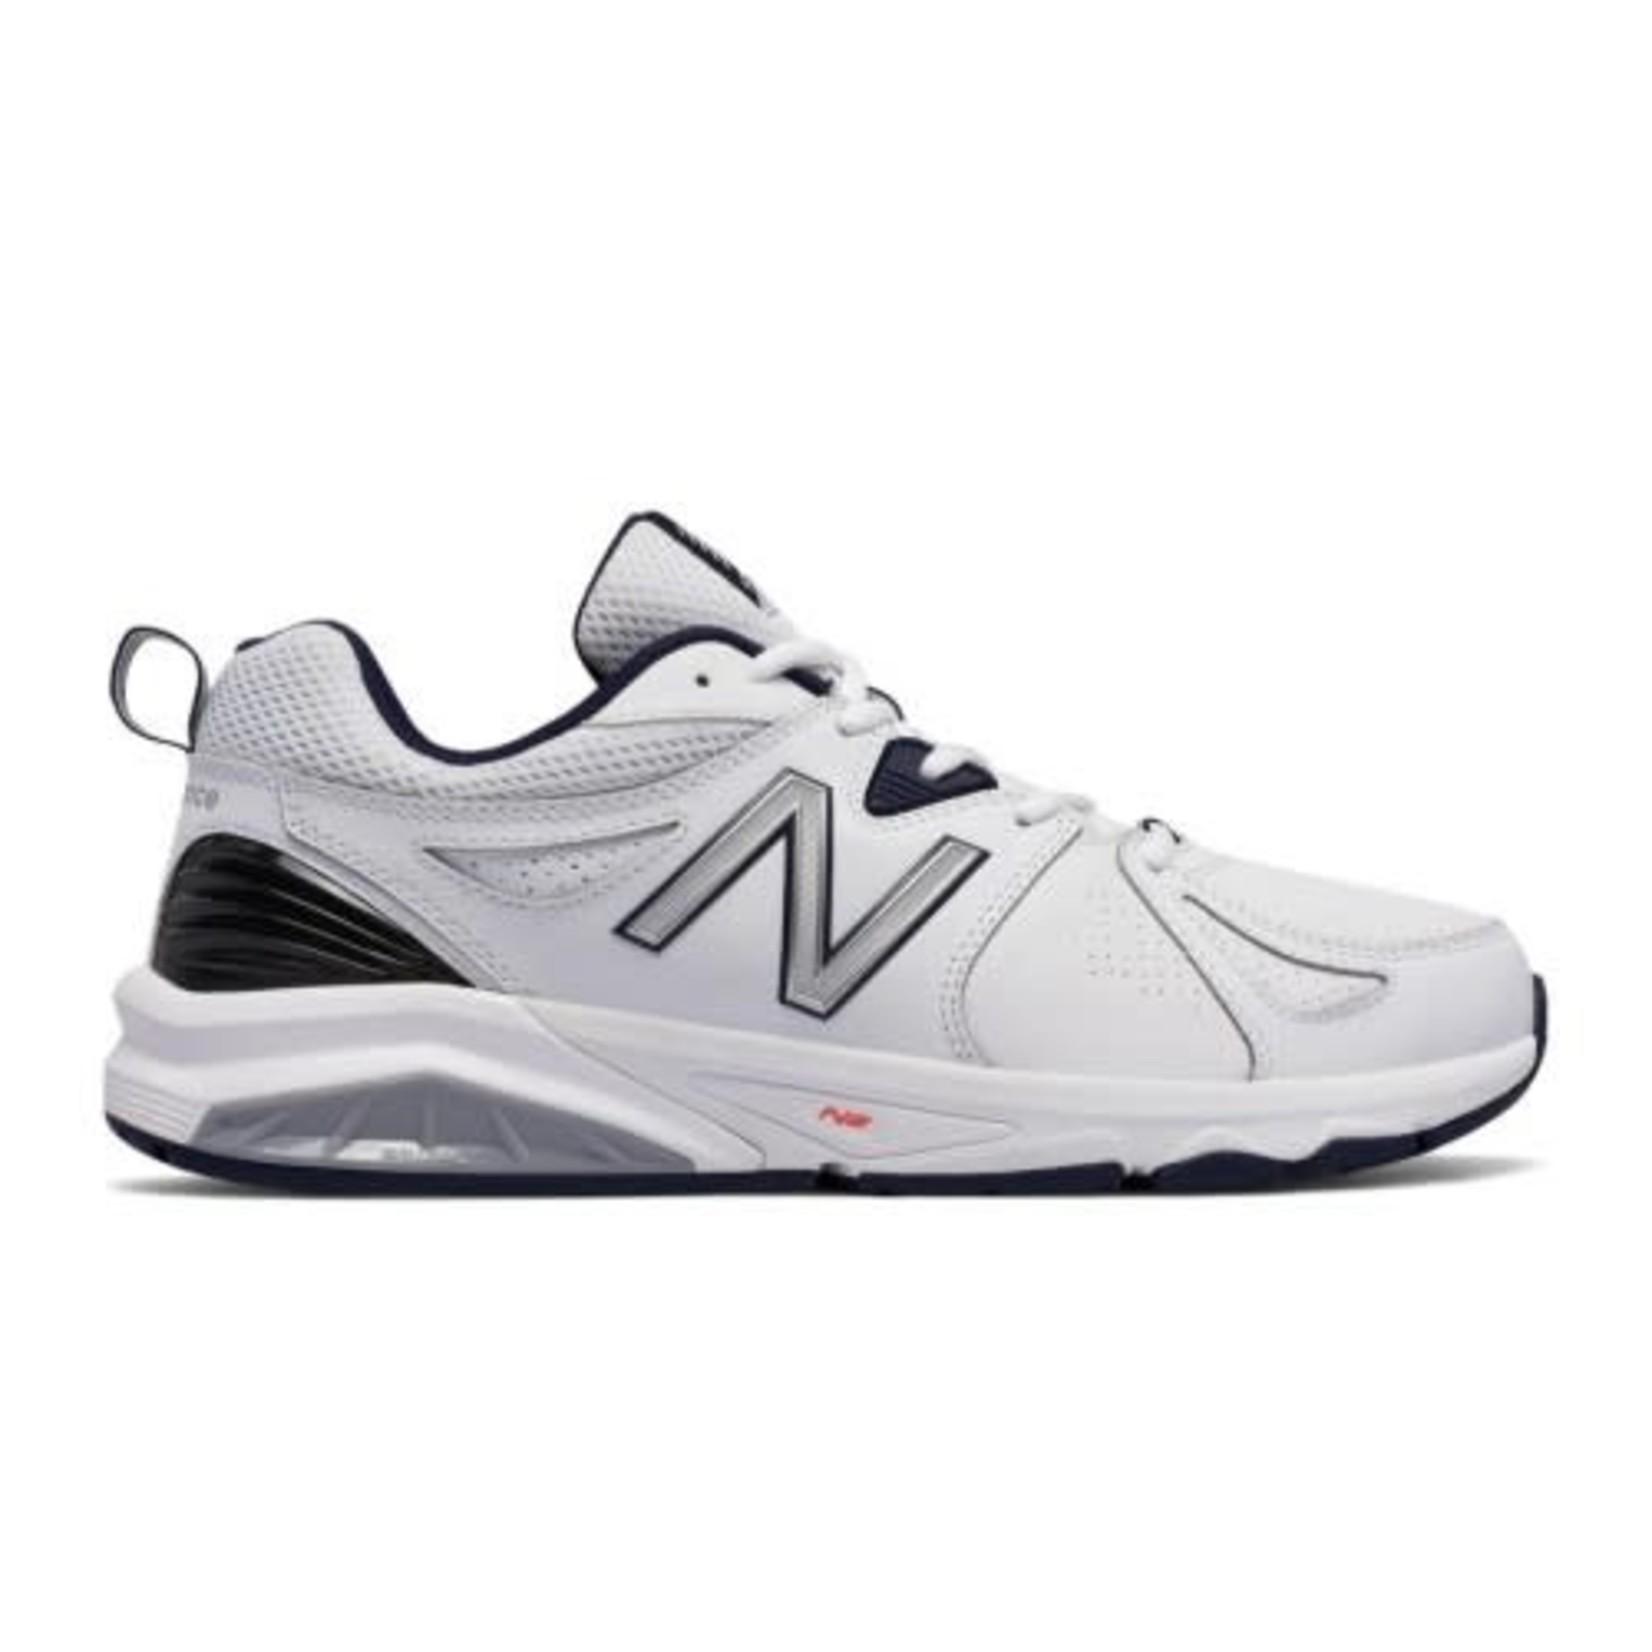 New Balance New Balance Training Shoes, 857 v2, Mens